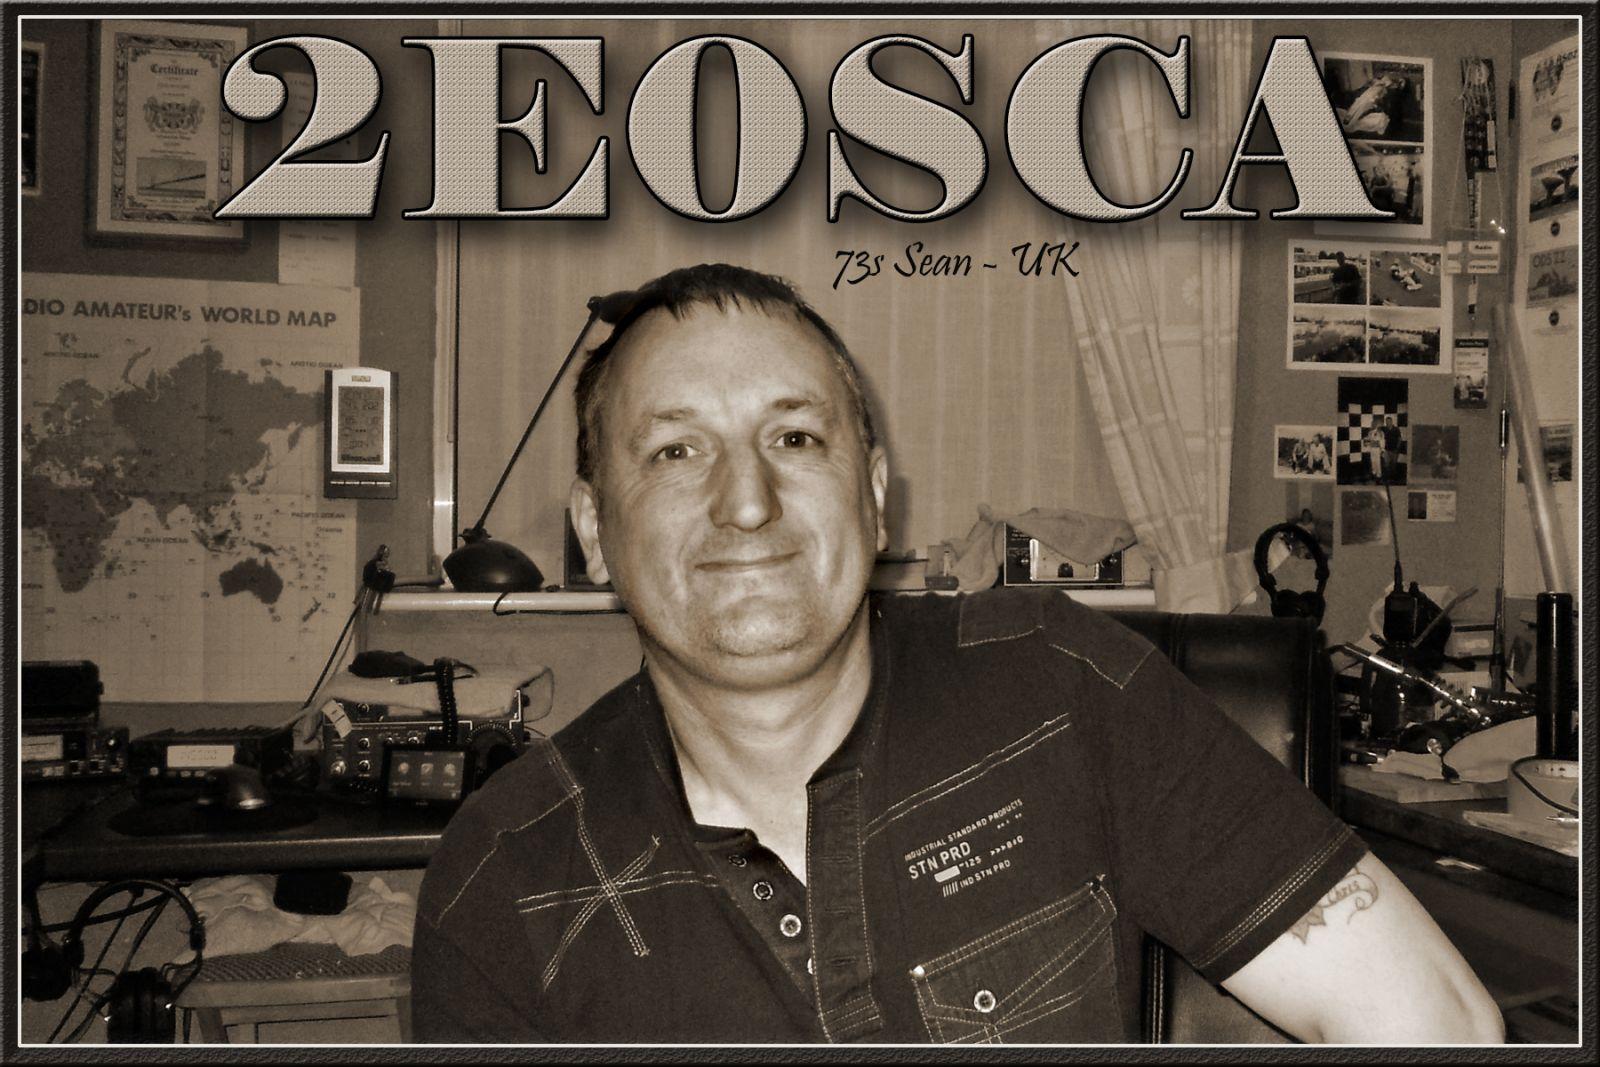 QSL image for 2E0SCA